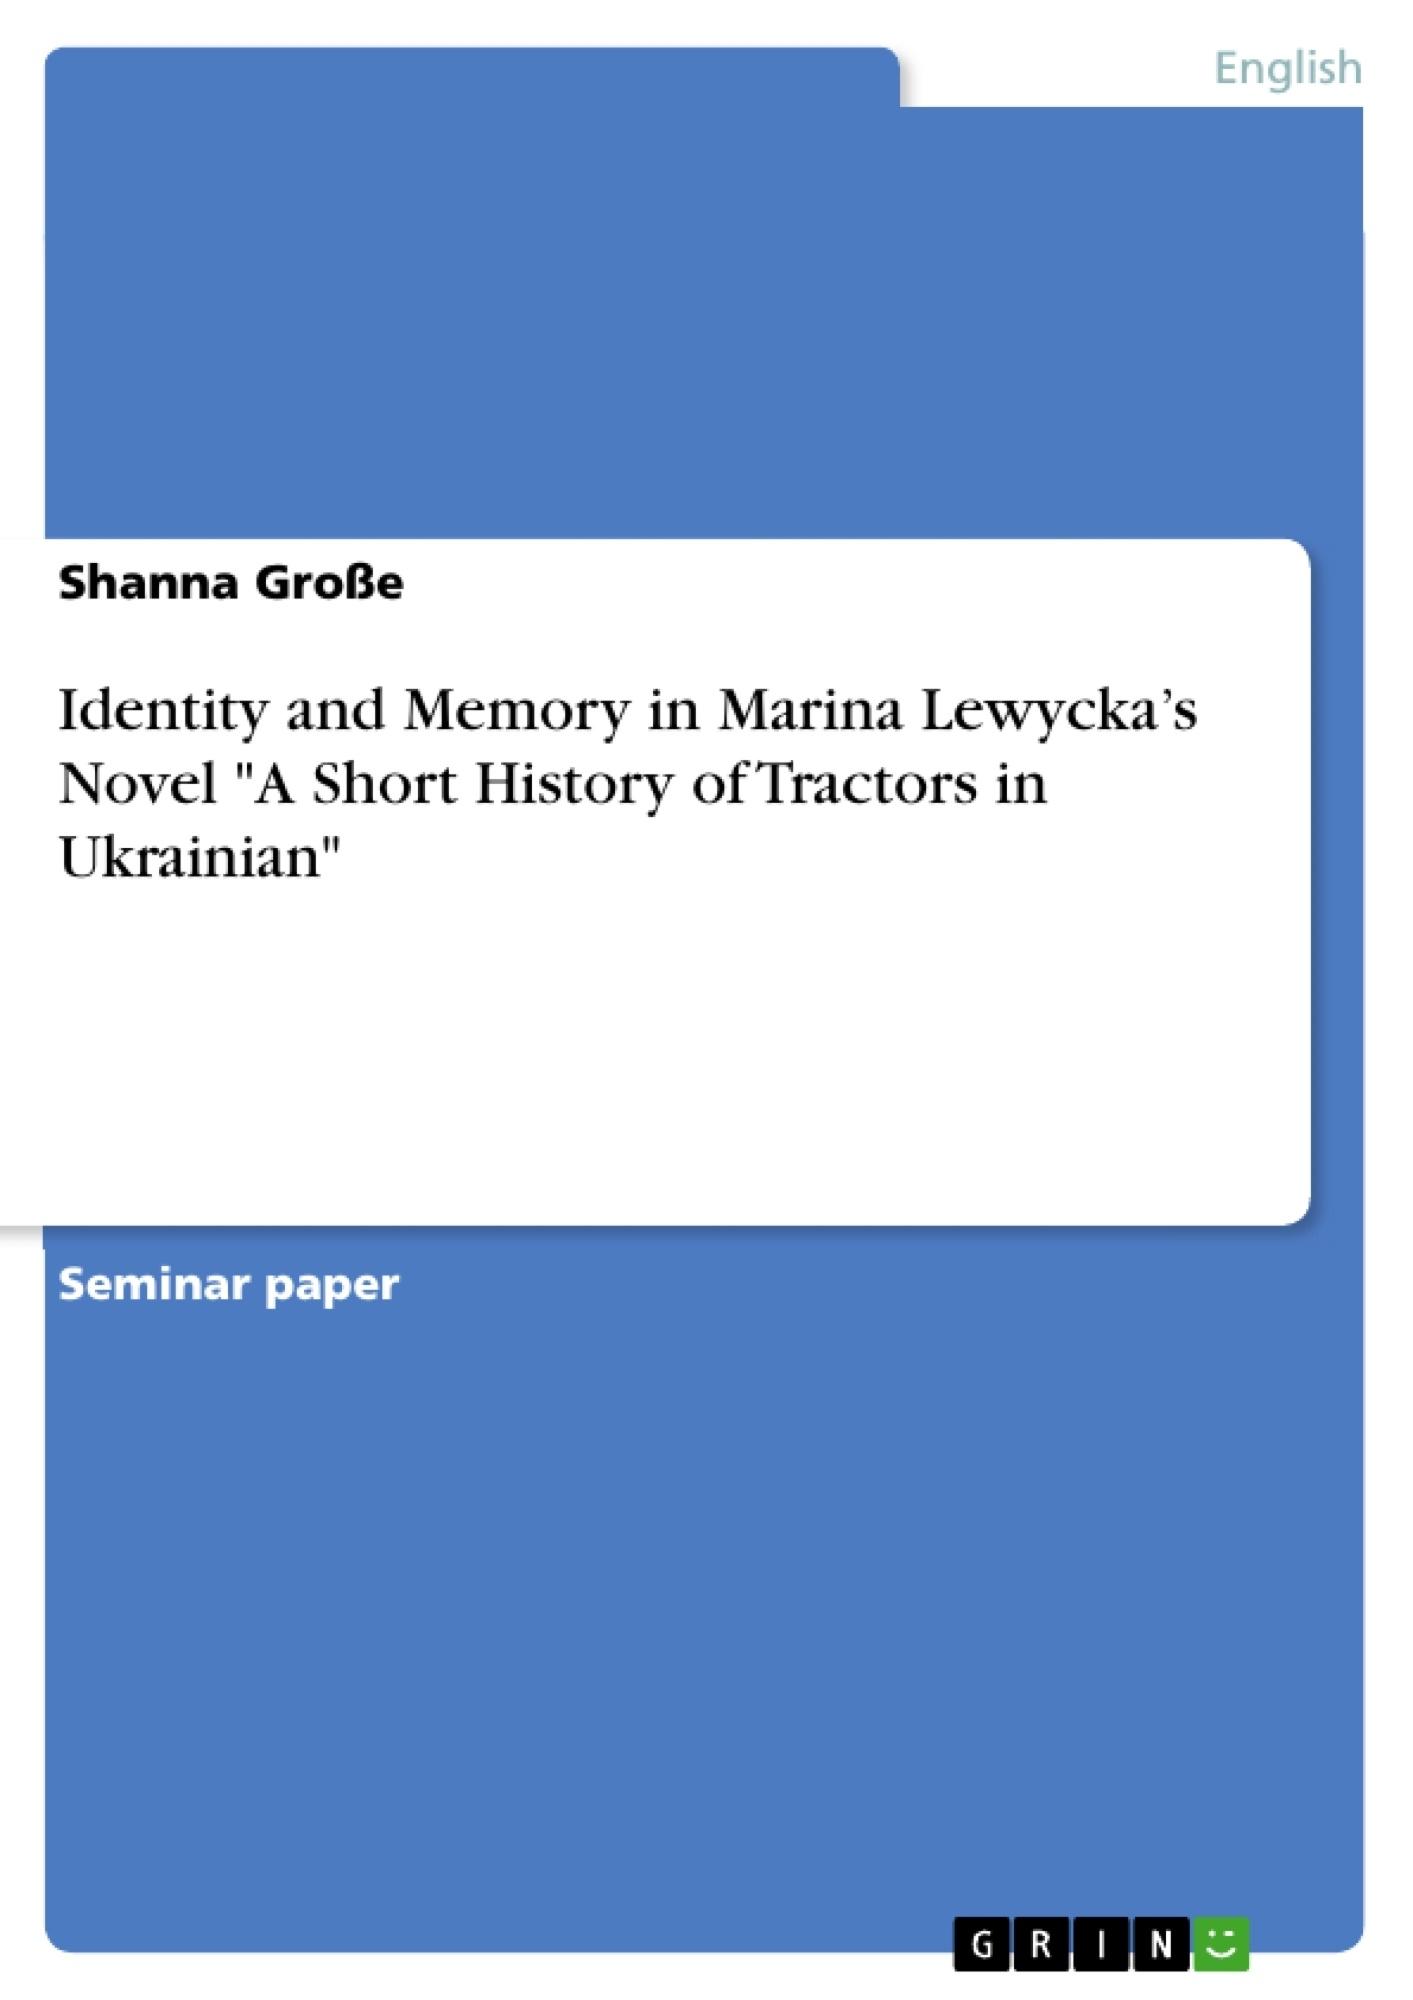 "Title: Identity and Memory in Marina Lewycka's Novel  ""A Short History of Tractors in Ukrainian"""